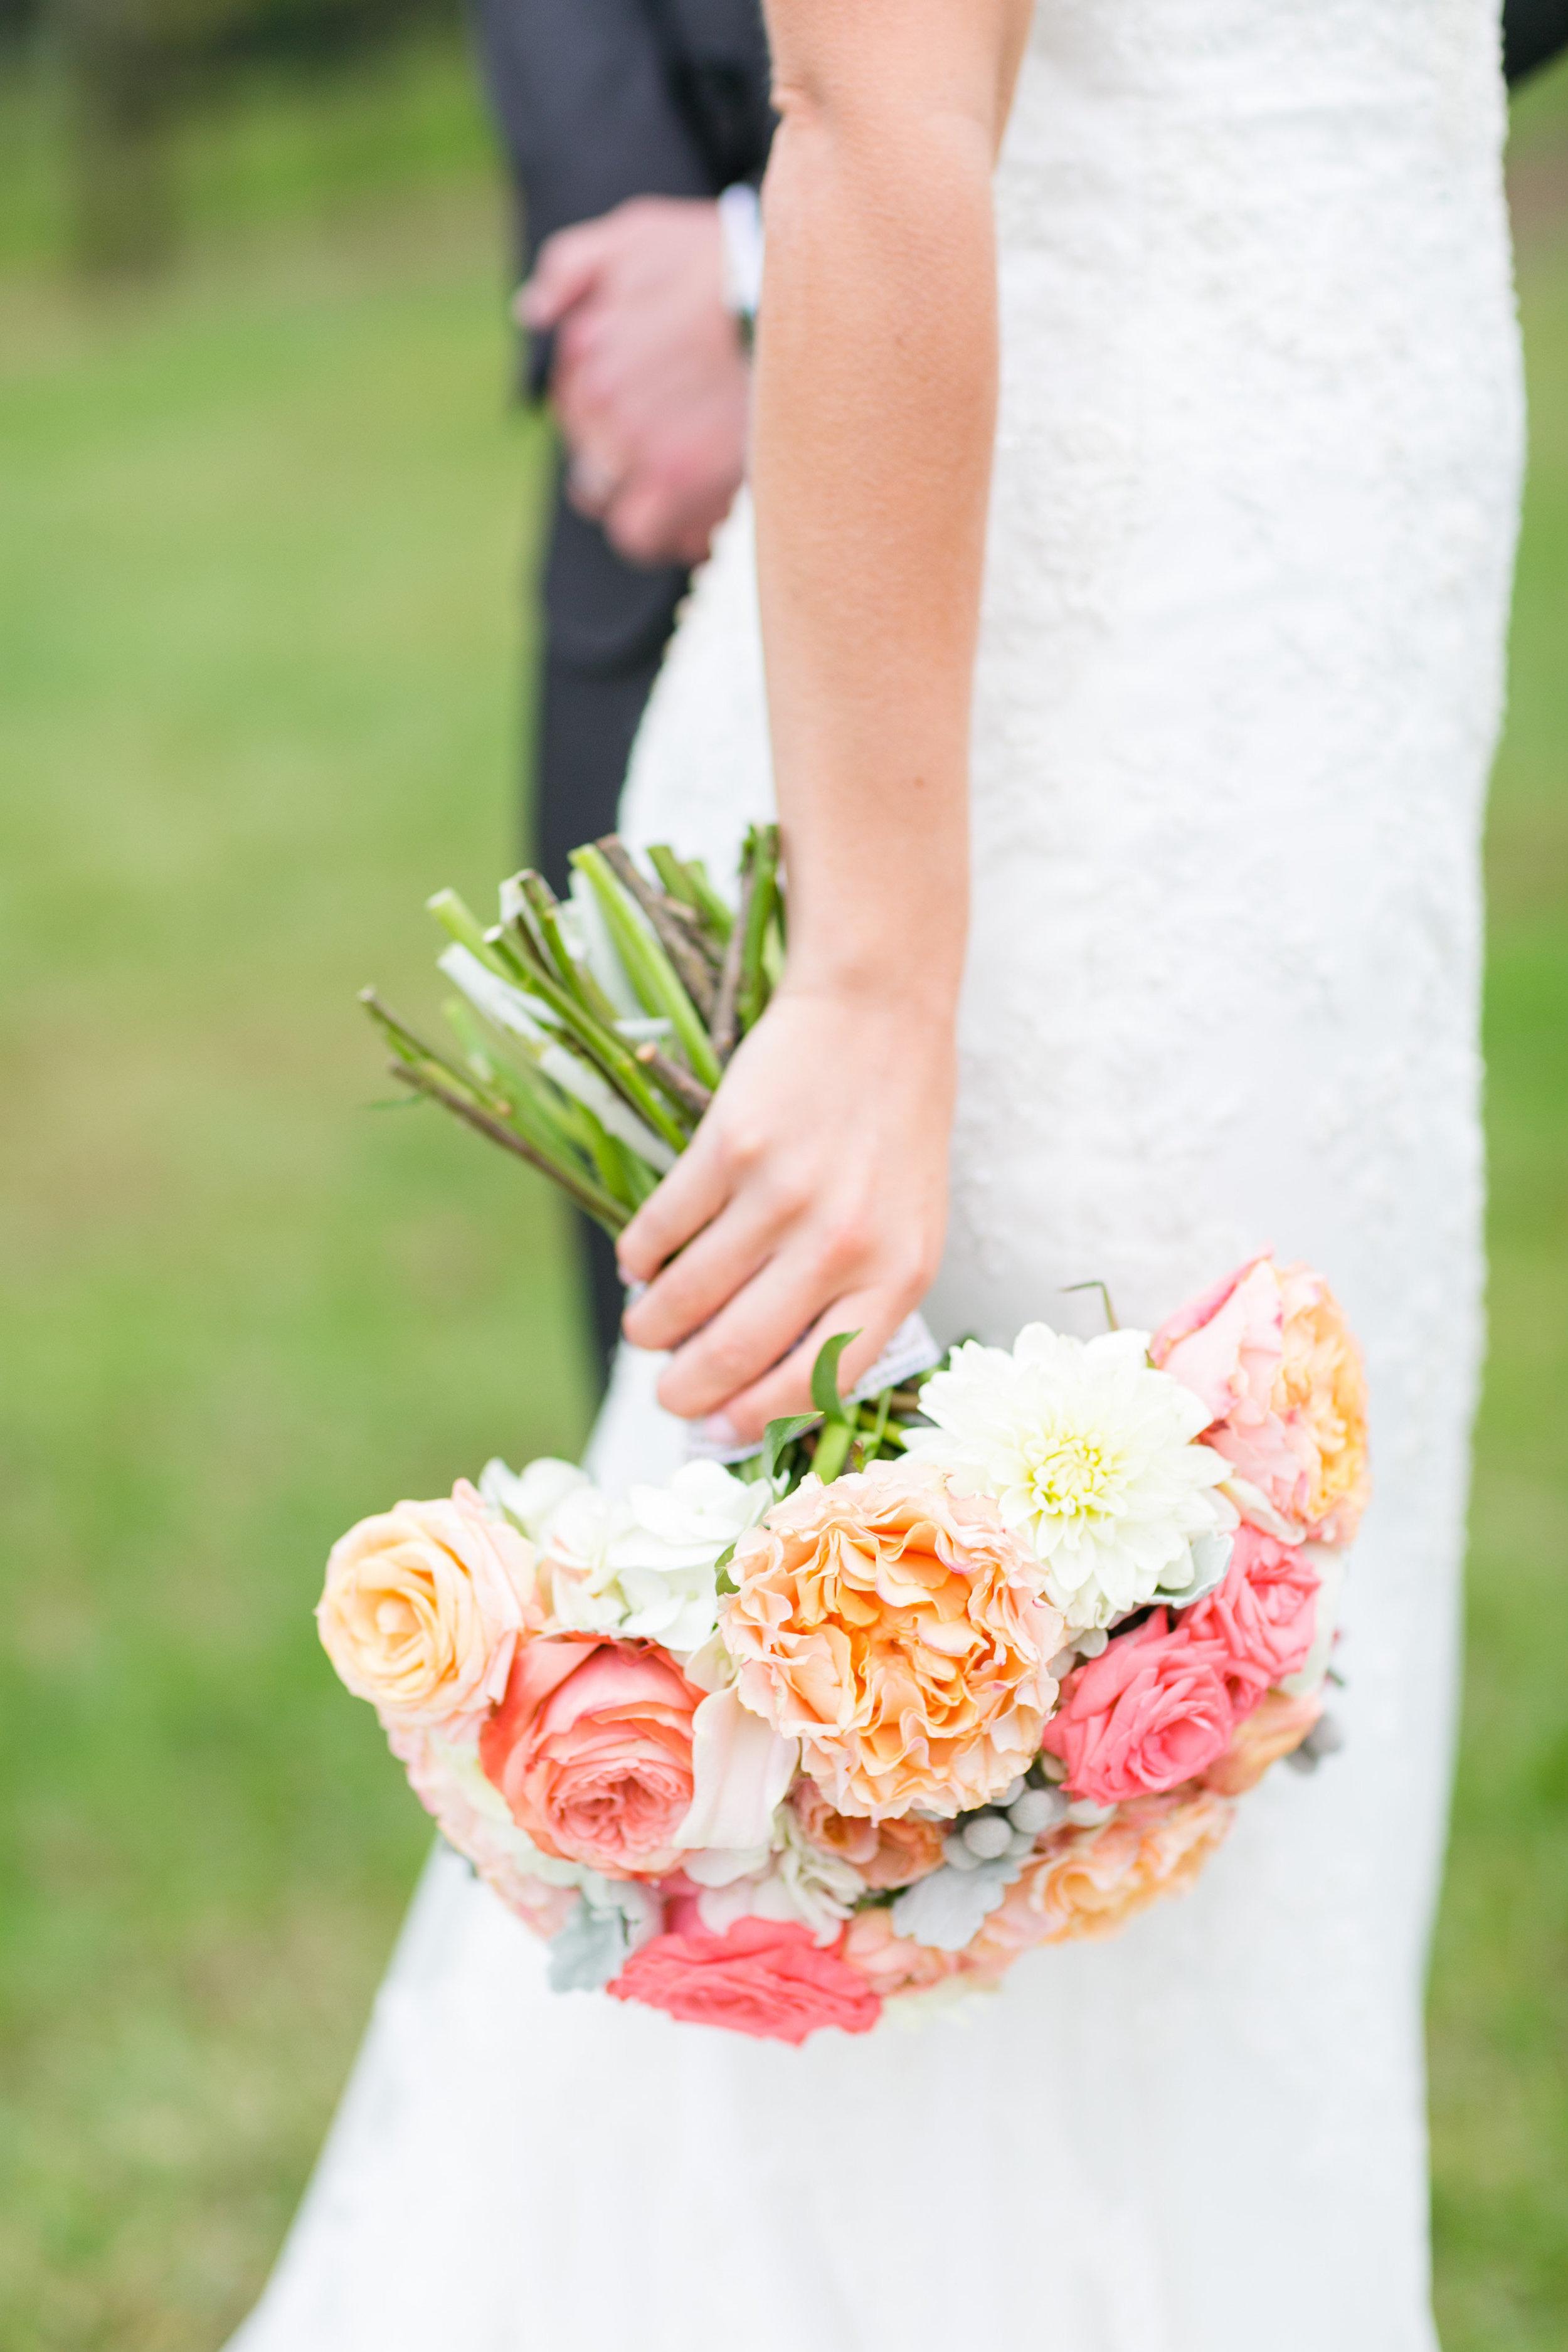 Stone Tower Winery Wedding Photos Virginia Wedding Photographer Megan Kelsey-21.jpg